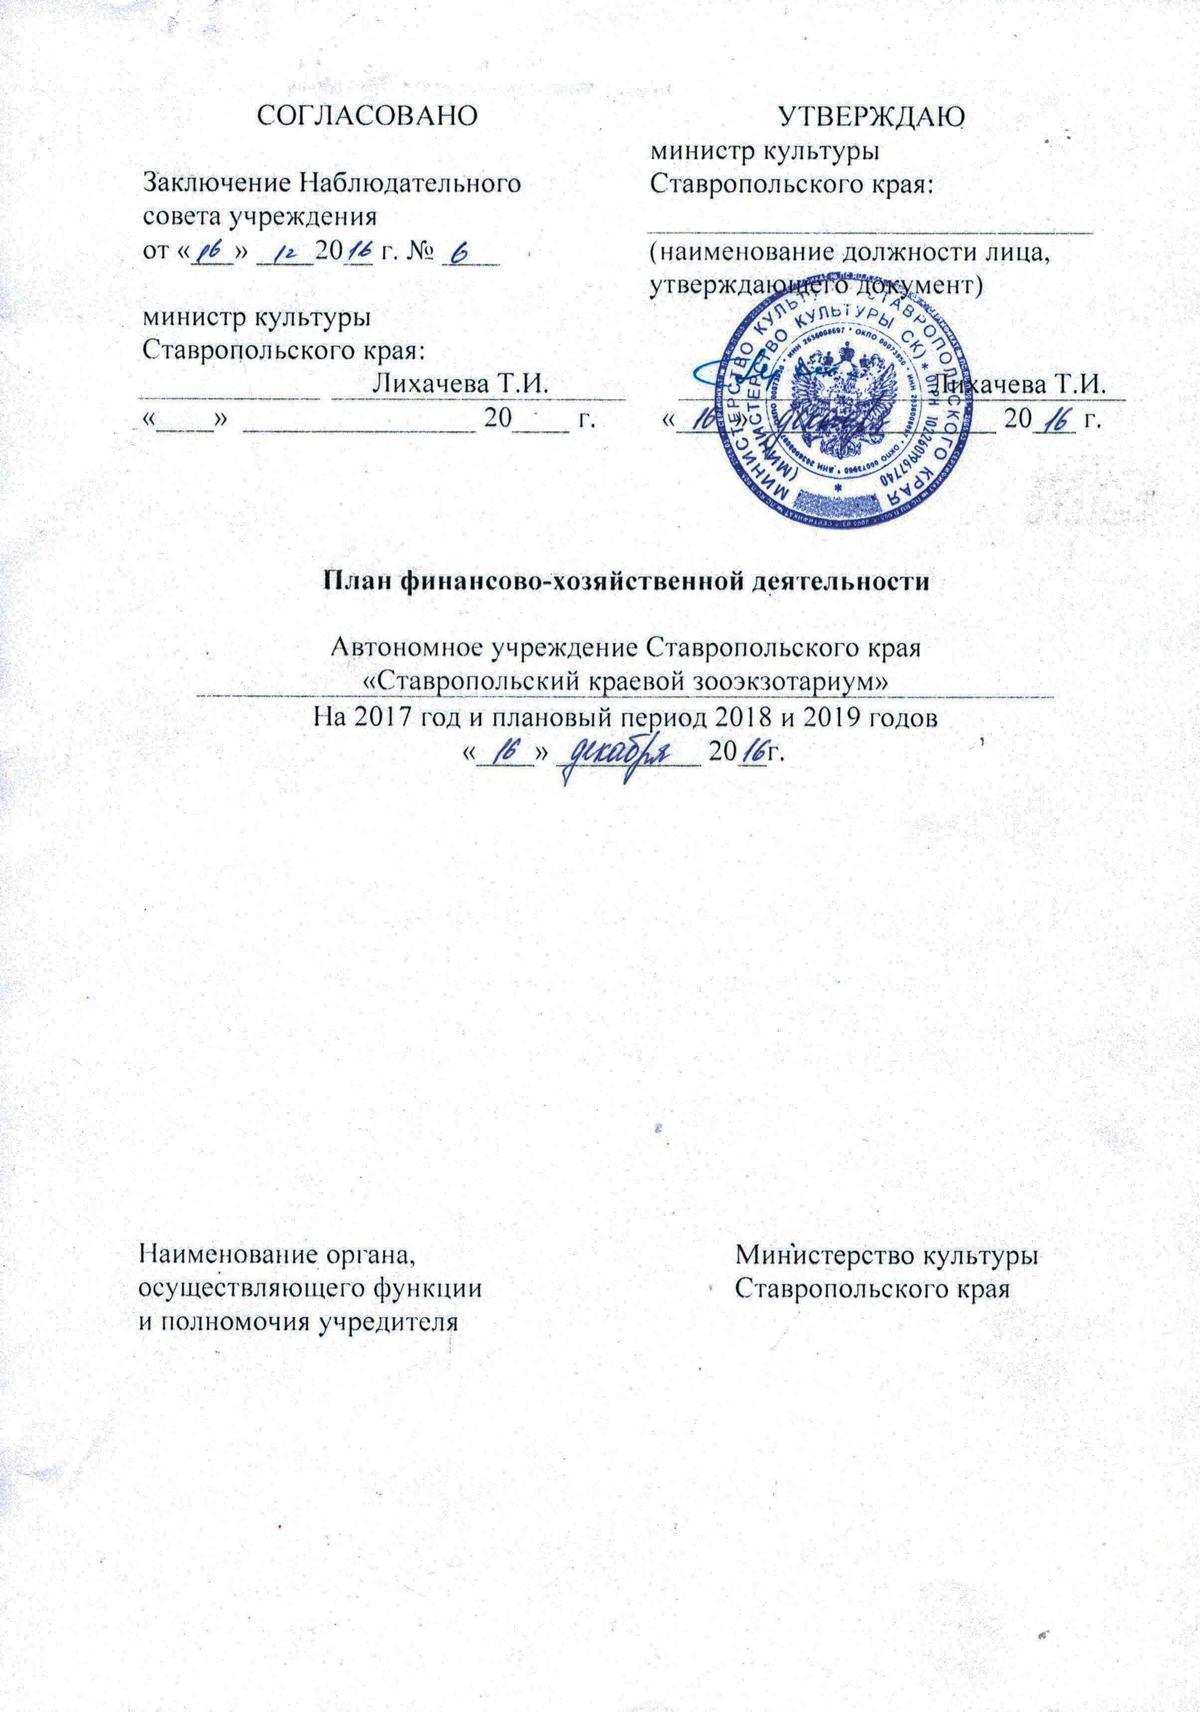 План финансово хозяйст. деятельнорсти на 2017- 2019